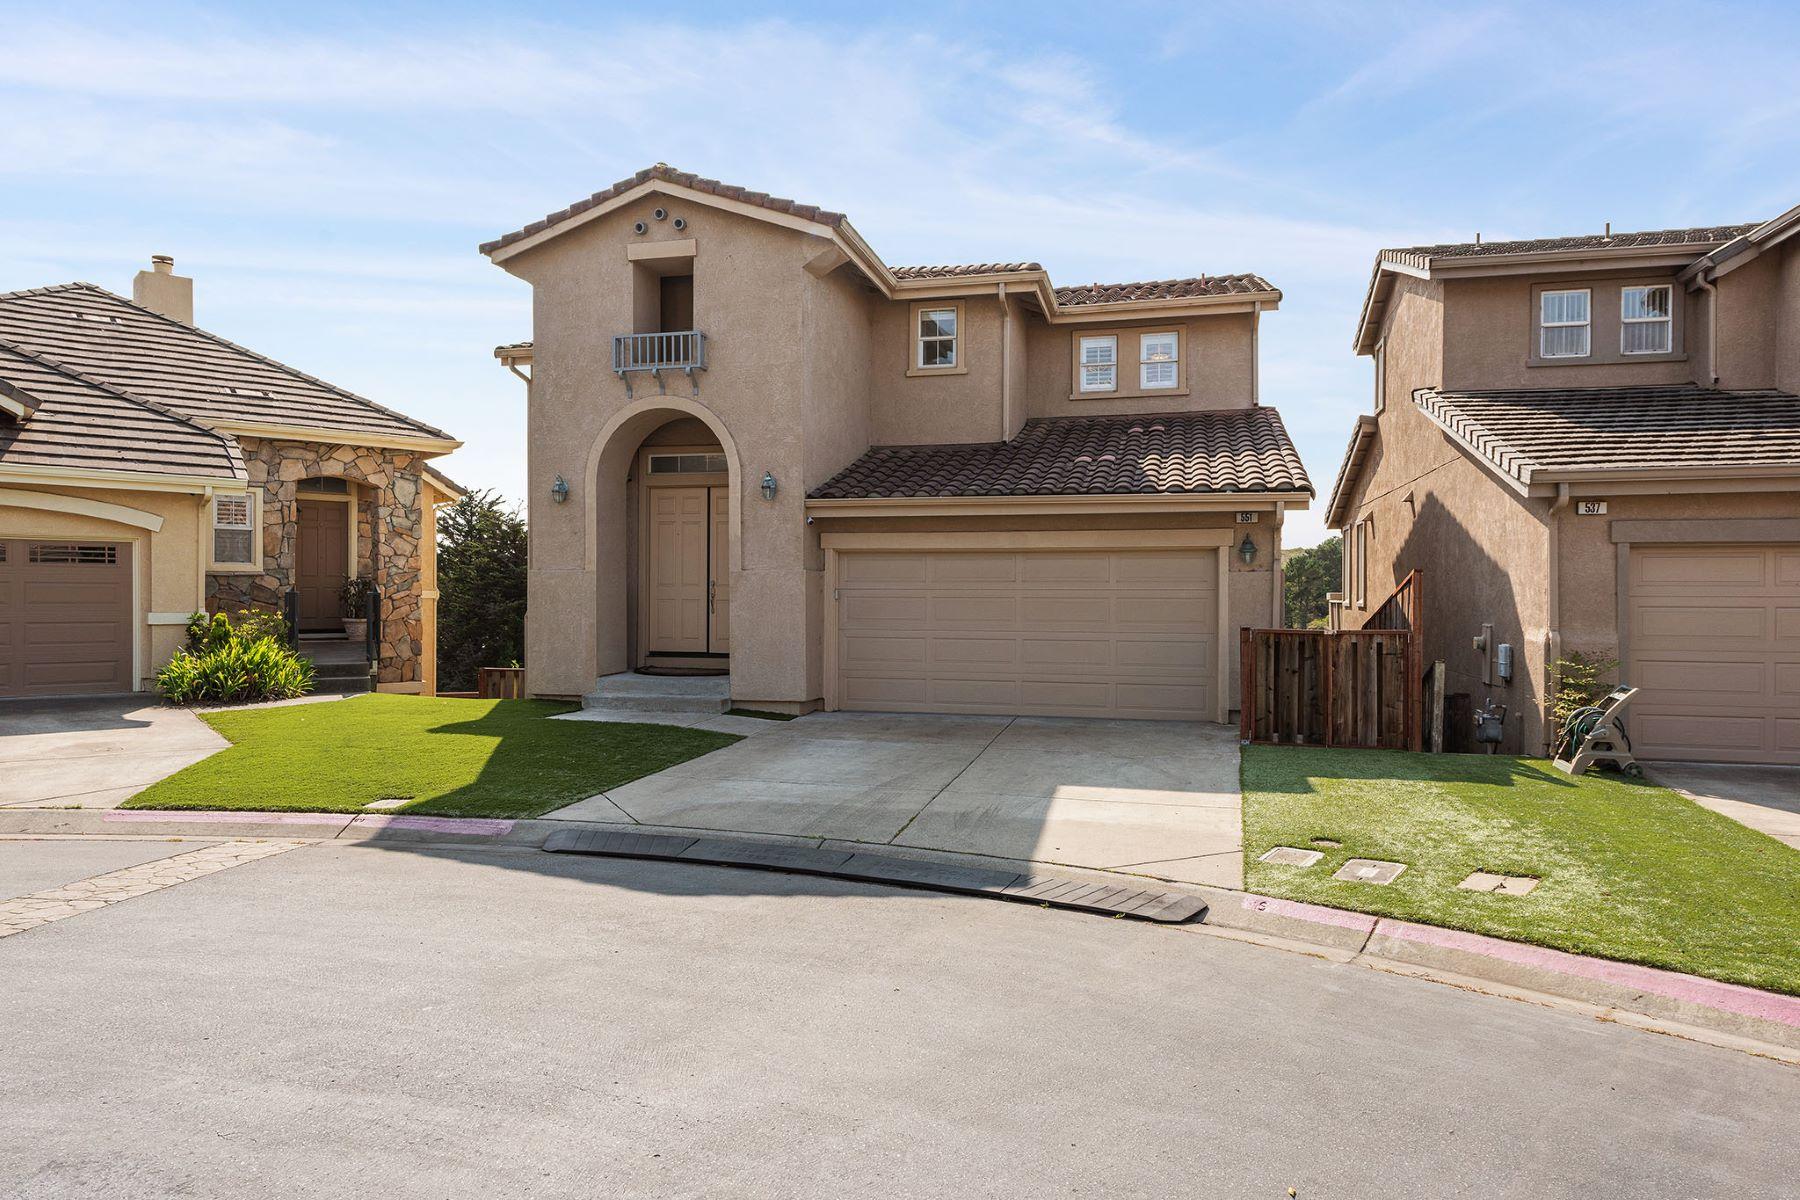 Single Family Homes por un Venta en The Crown Jewel of the Skyridge Estates 551 Sea Spray Ct Pacifica, California 94044 Estados Unidos